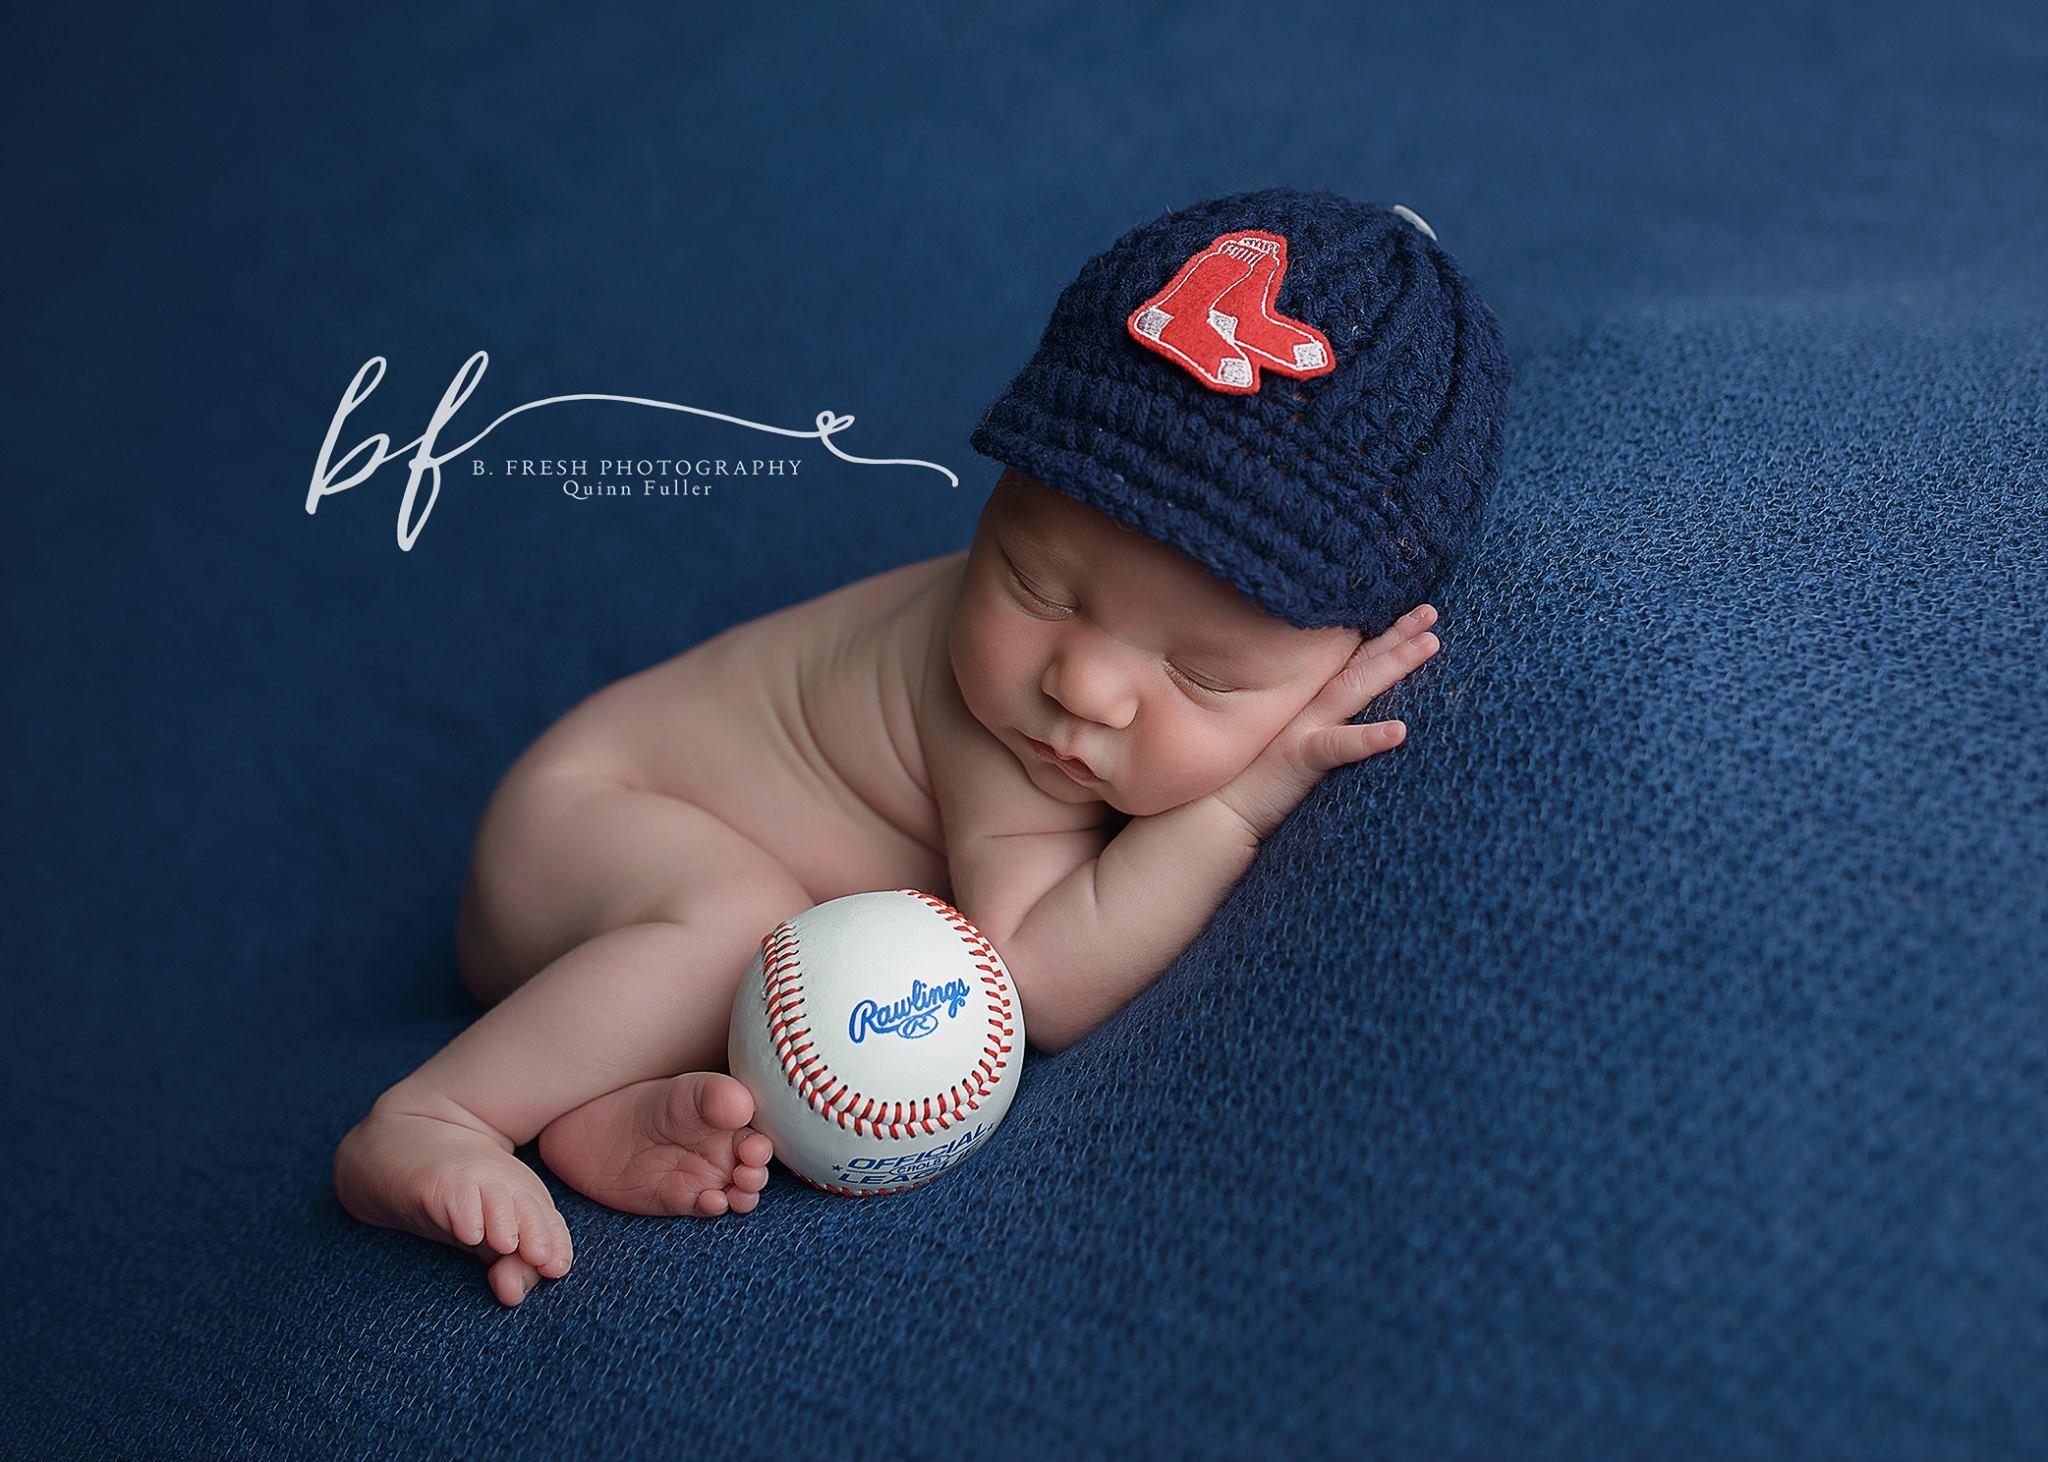 ... sale newborn photo propboston red sox brim hatbaby boy hat 98729 d4d60 a84579971ca